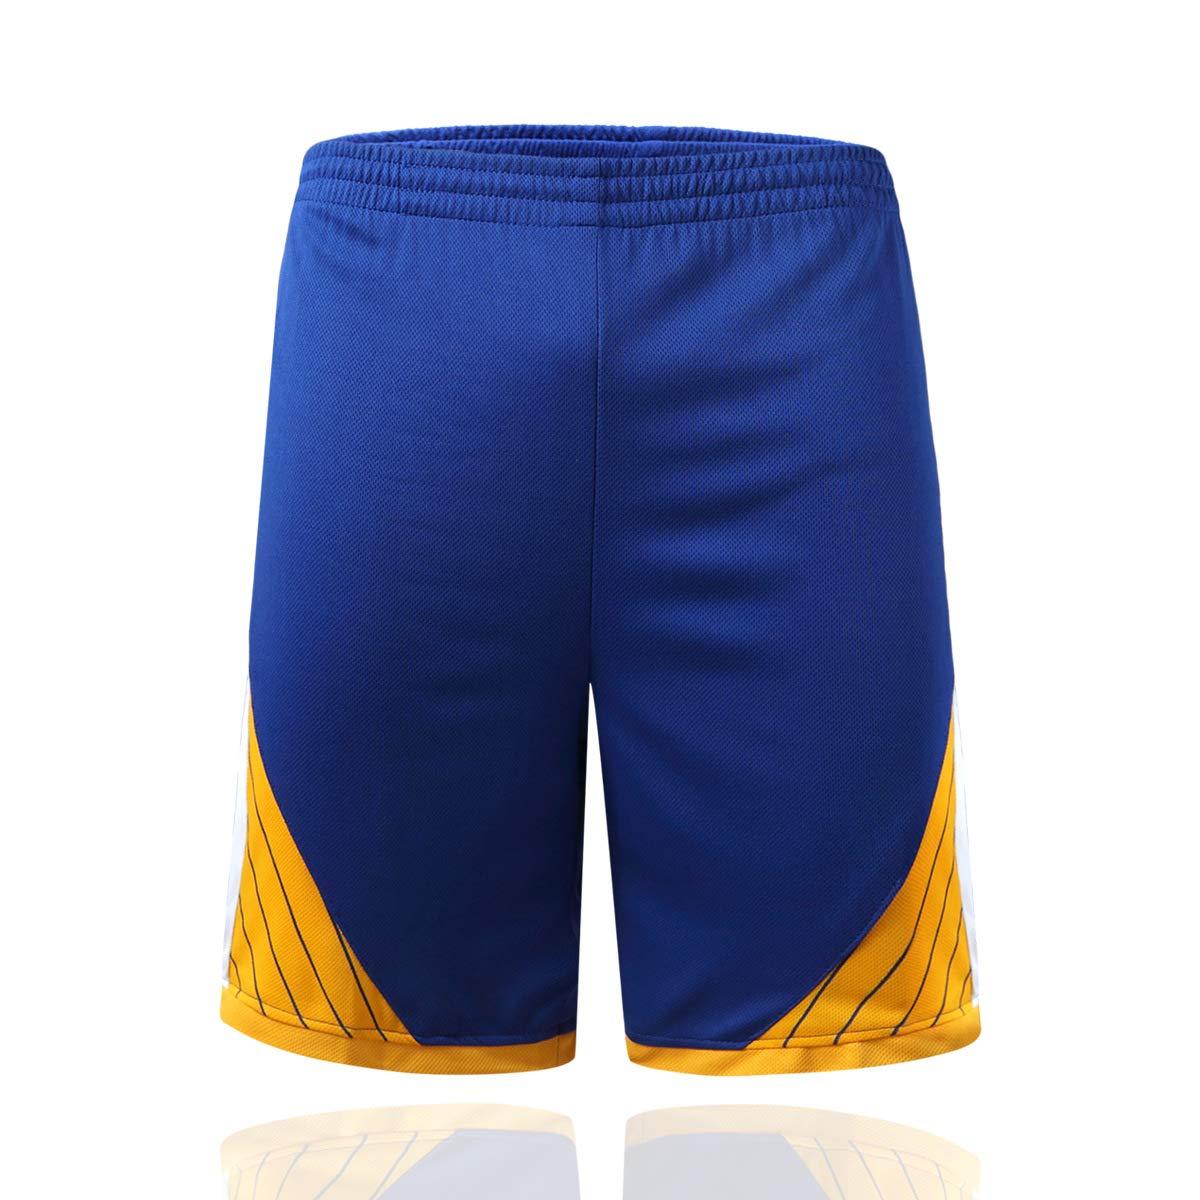 AGAB Mens NBA Curry # 30 Golden State Warriors Retro Pantaloncini da Basket Summer Jersey Basket Uniform Top e Short One Set